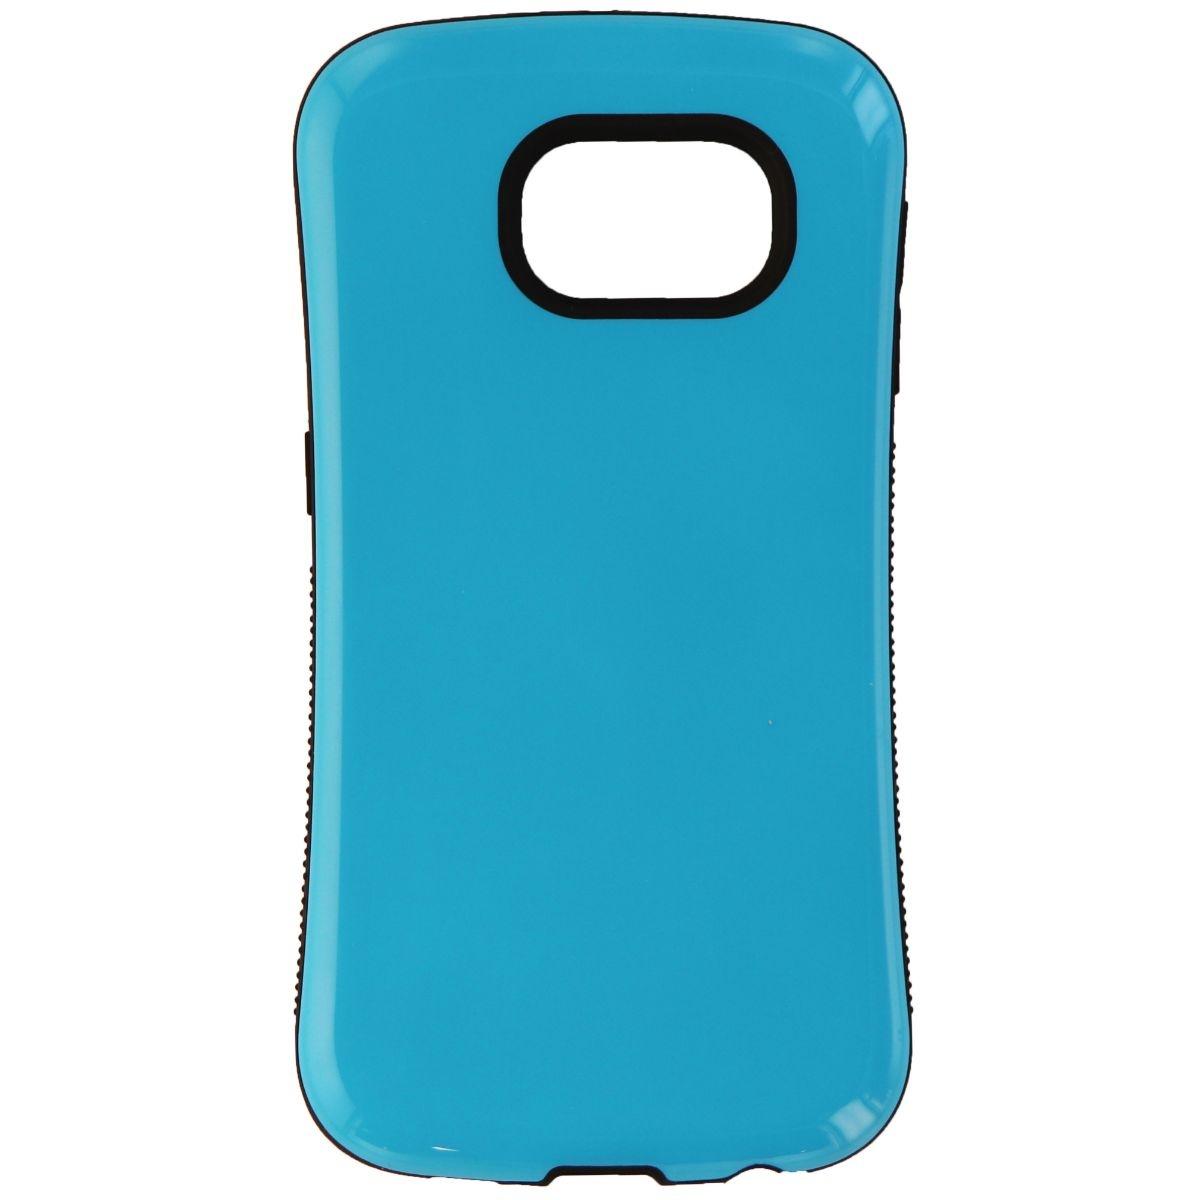 Nimbus9 Capsule Series case for Samsung Galaxy S6 - Blue / Black